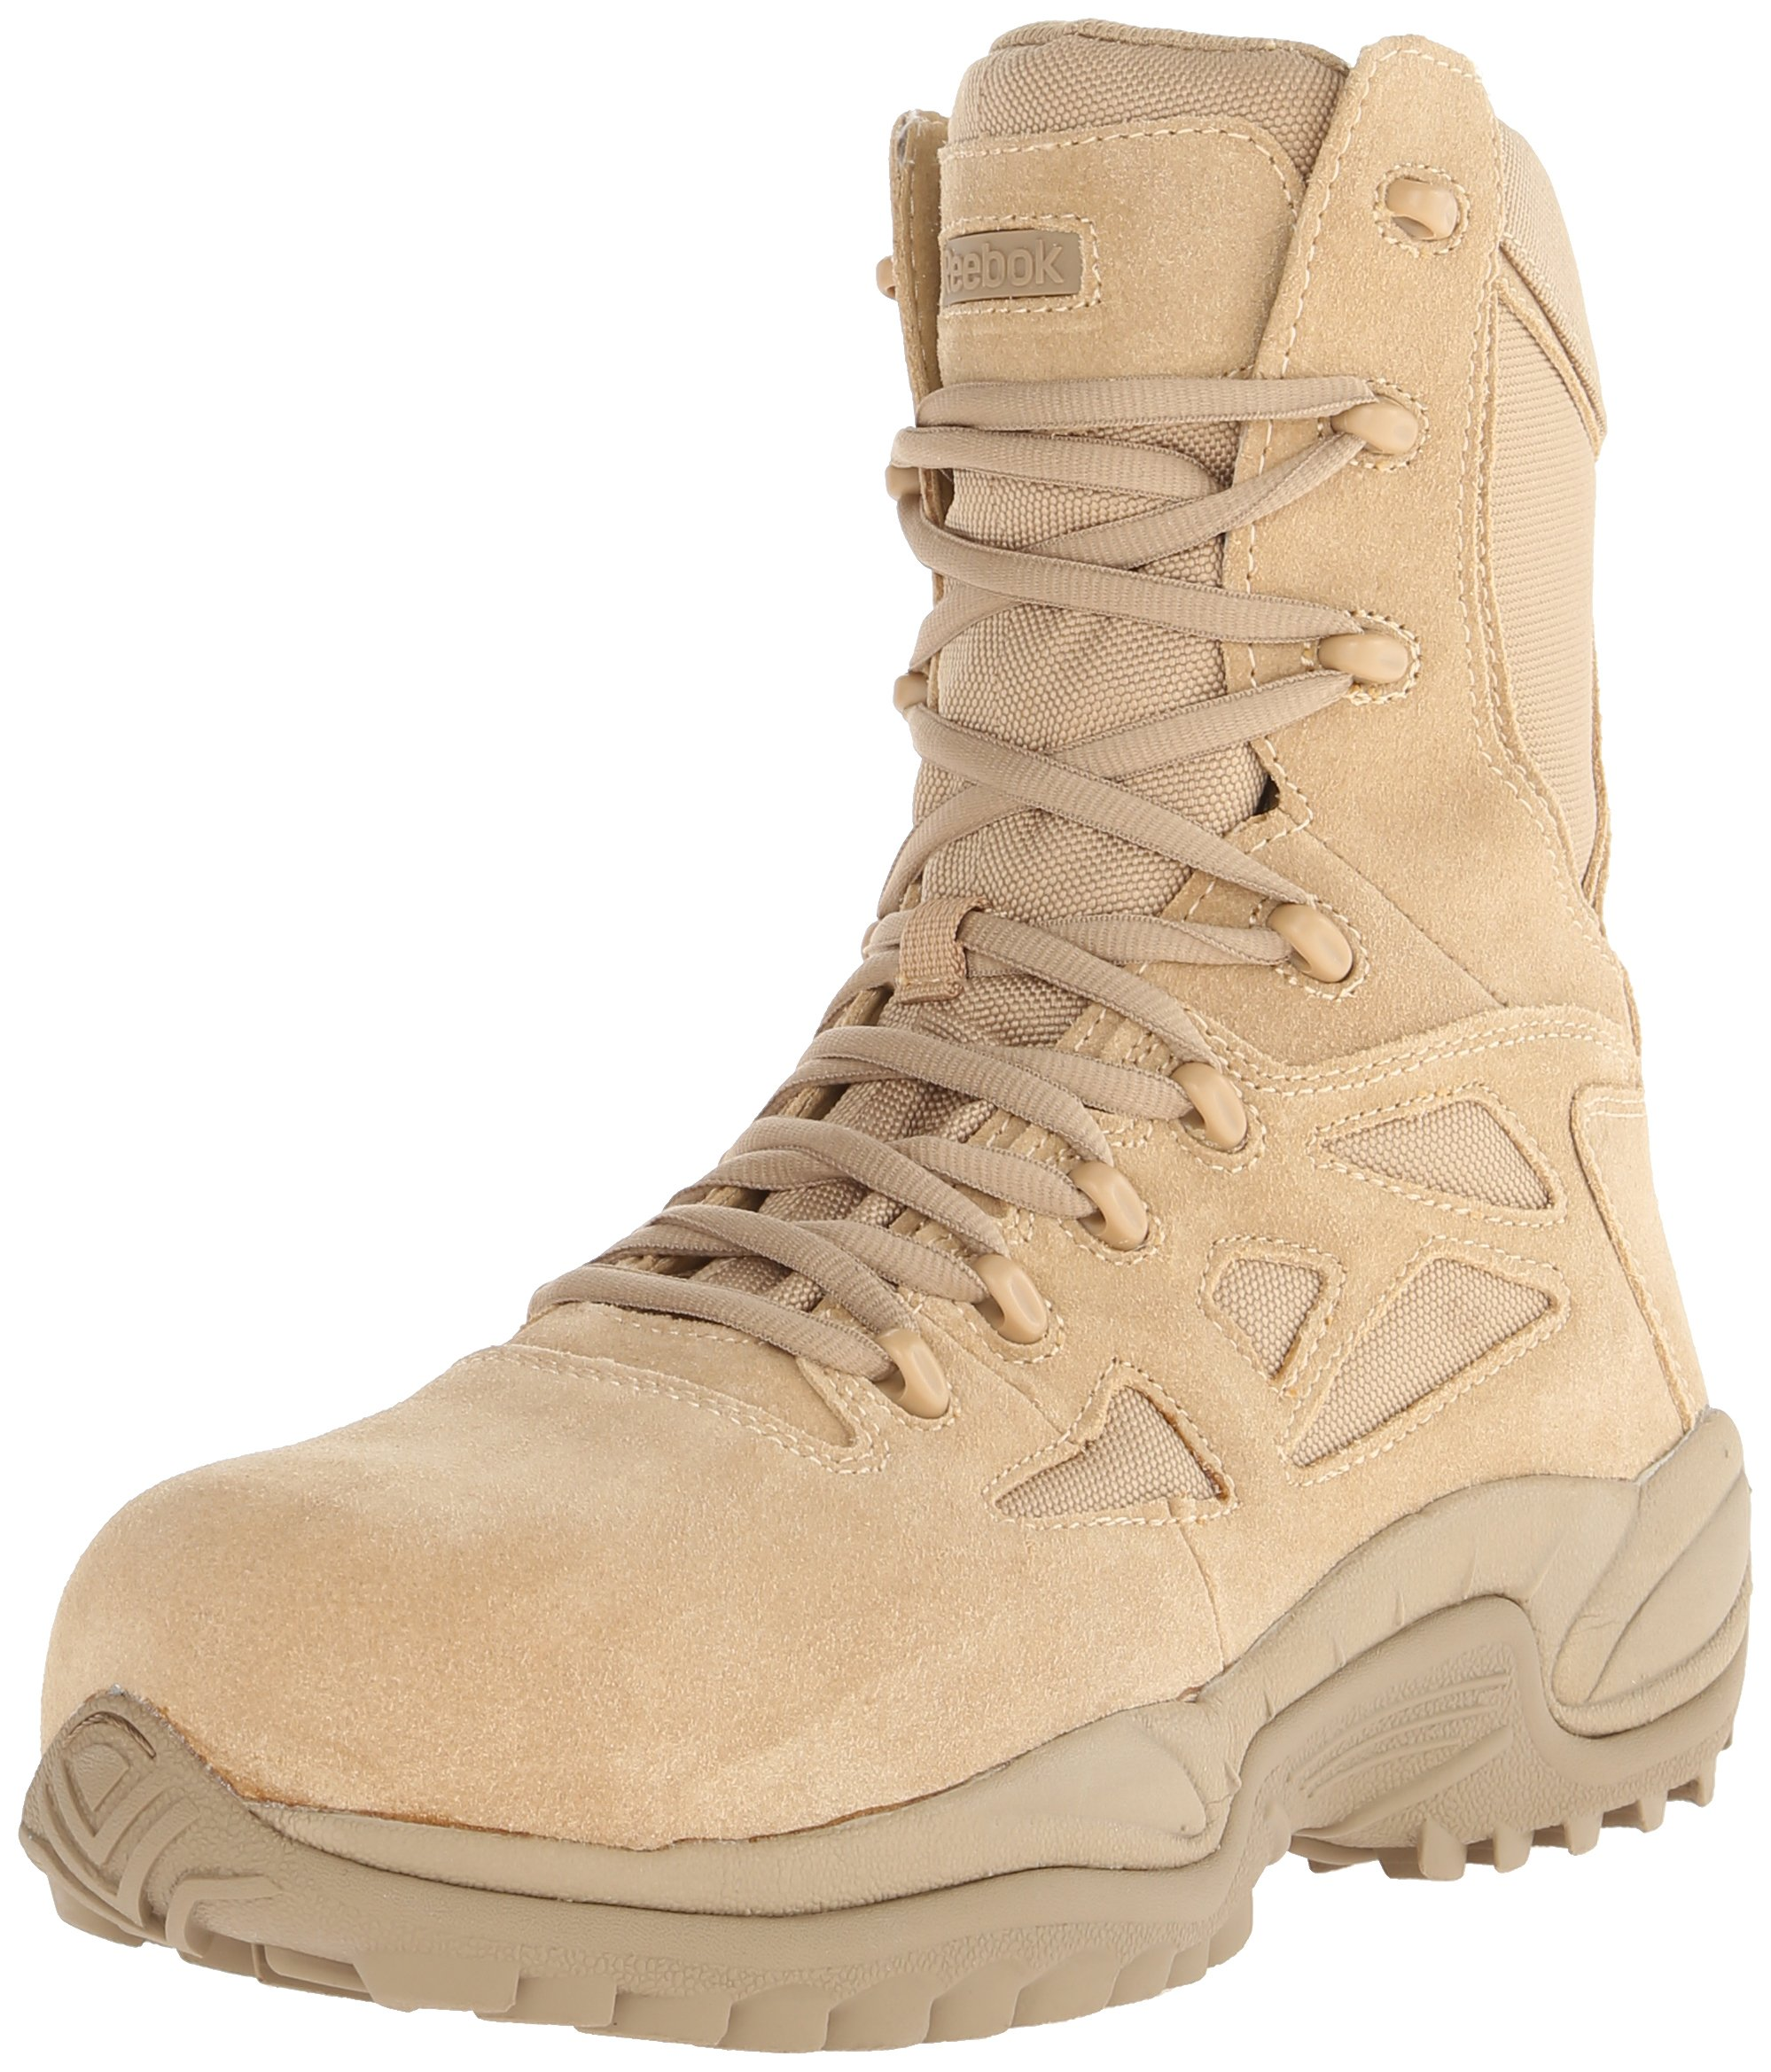 Reebok Work Men's Rapid Response RB8894 Safety Boot,Tan,10.5 W US by Reebok Work